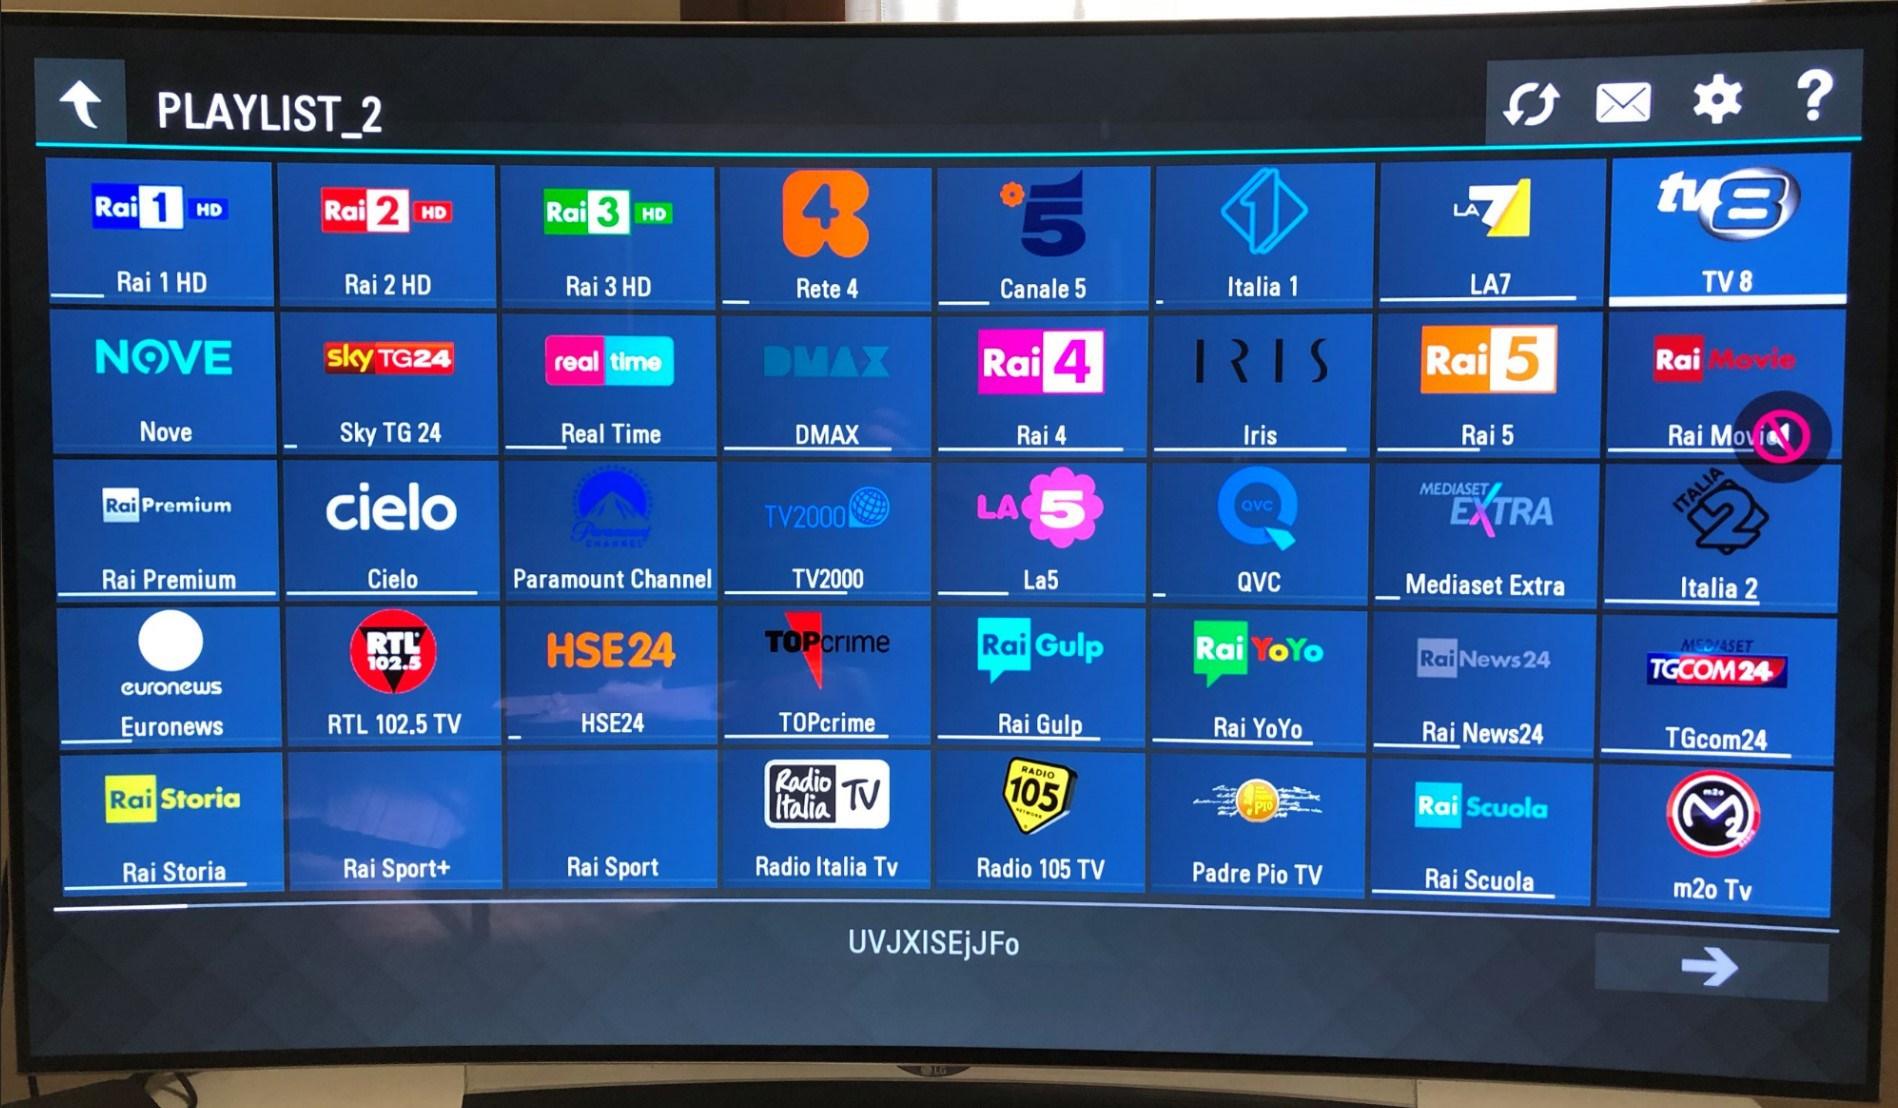 Come vedere IPTV sul PC (Windows/macOS/Linux)